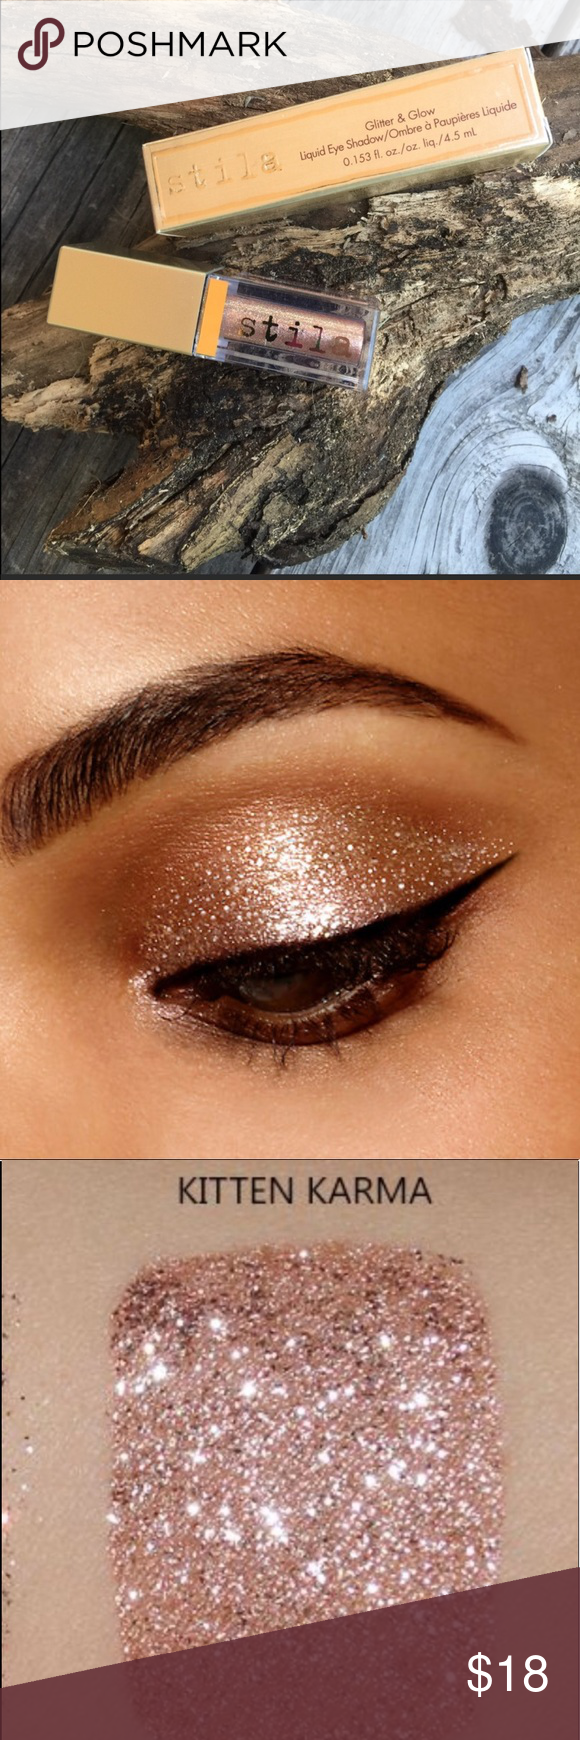 Stila Glitter Glow Liquid Eyeshadow Liquid Eyeshadow Stila Glitter And Glow Stila Glitter